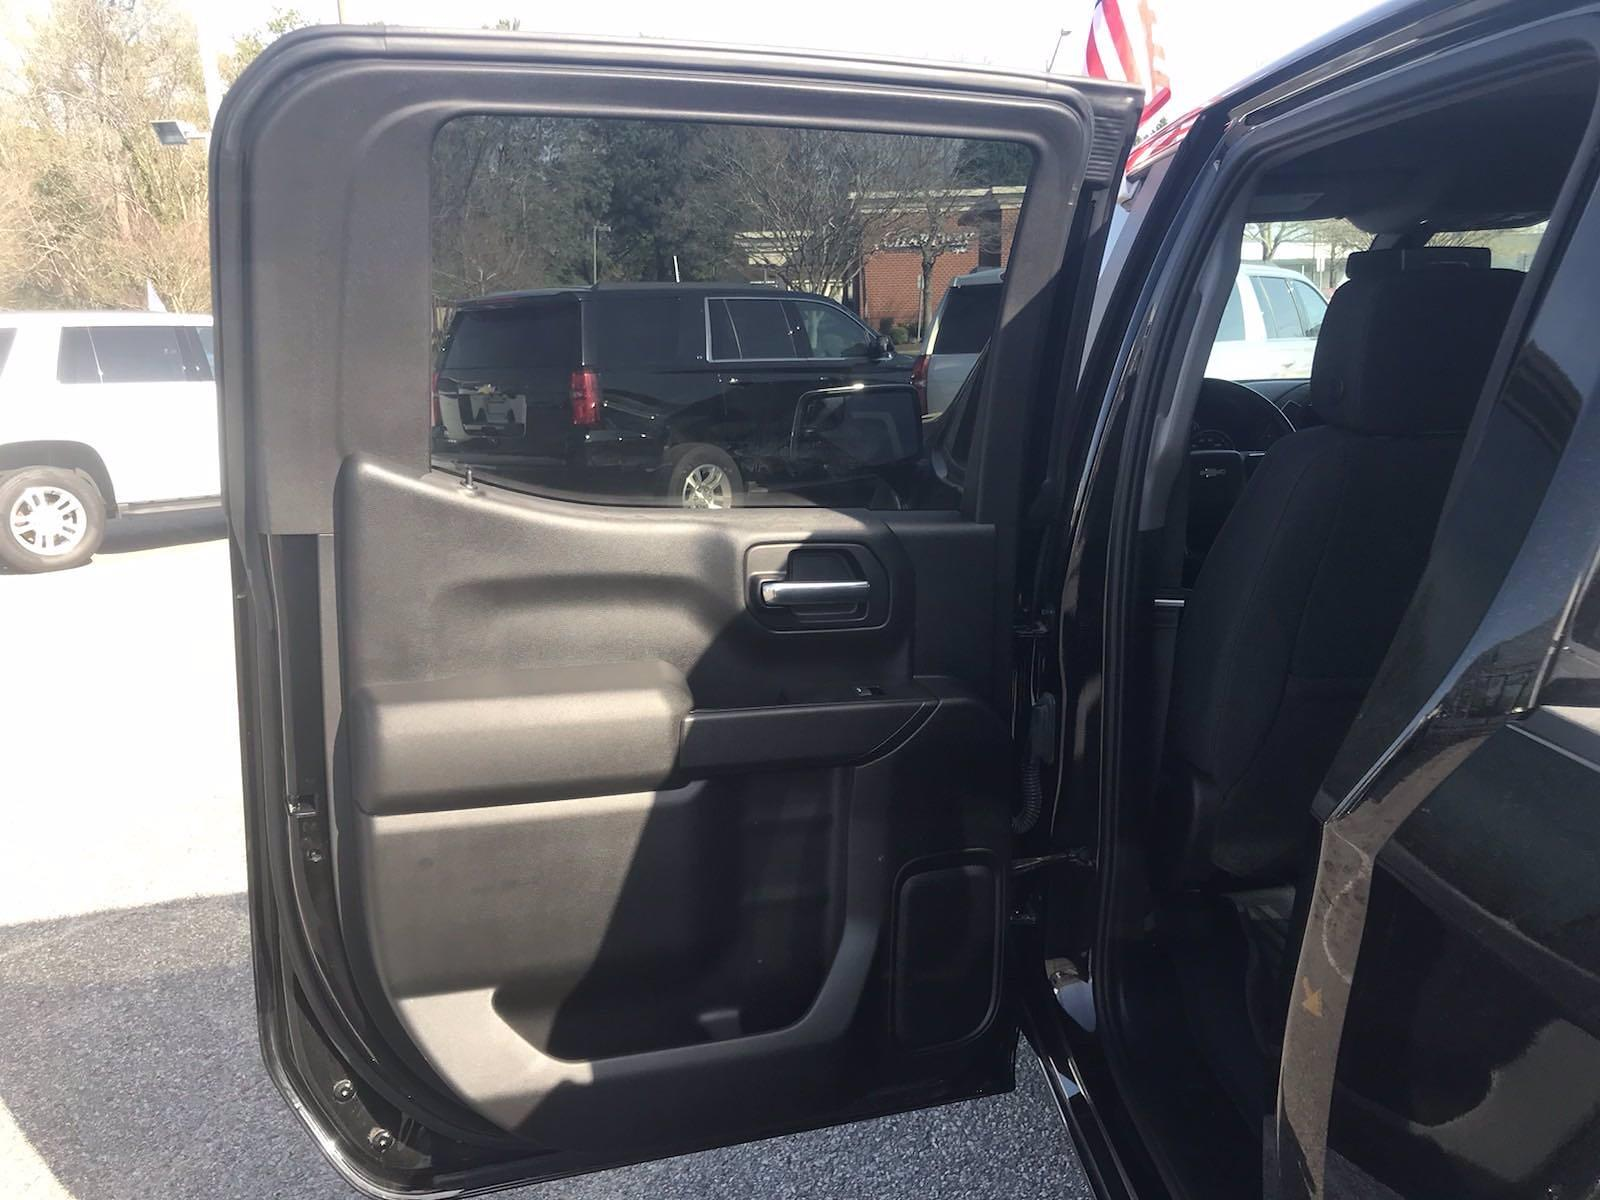 2019 Chevrolet Silverado 1500 Crew Cab 4x4, Pickup #16486P - photo 40